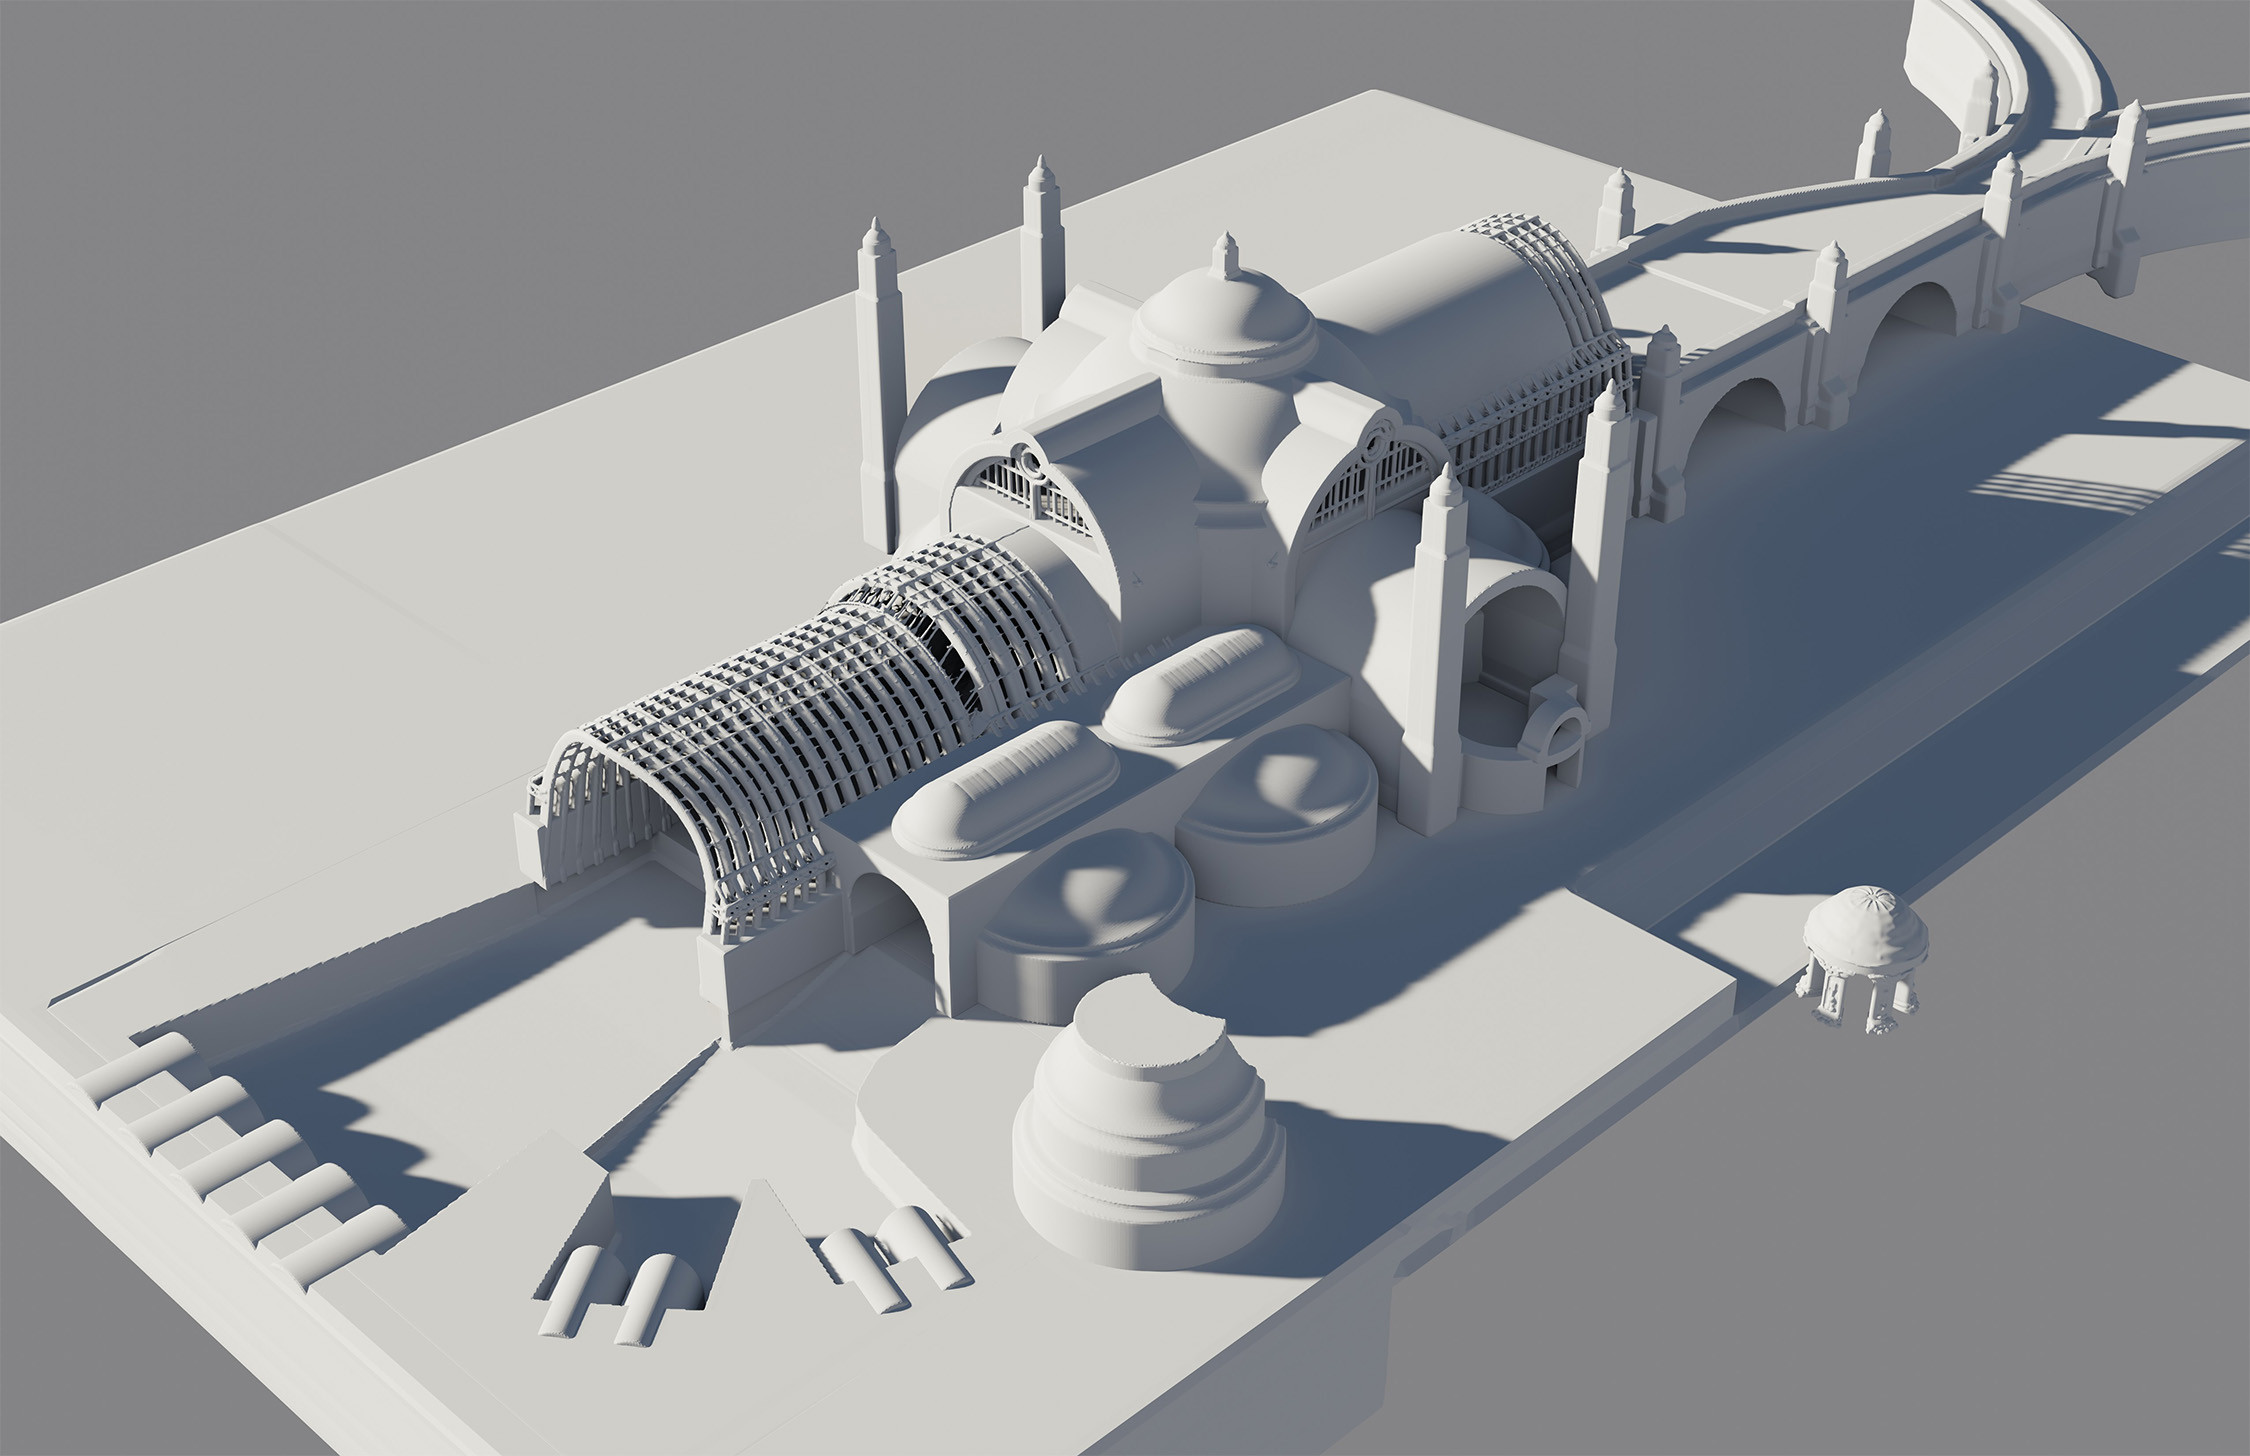 3DCoat rough model